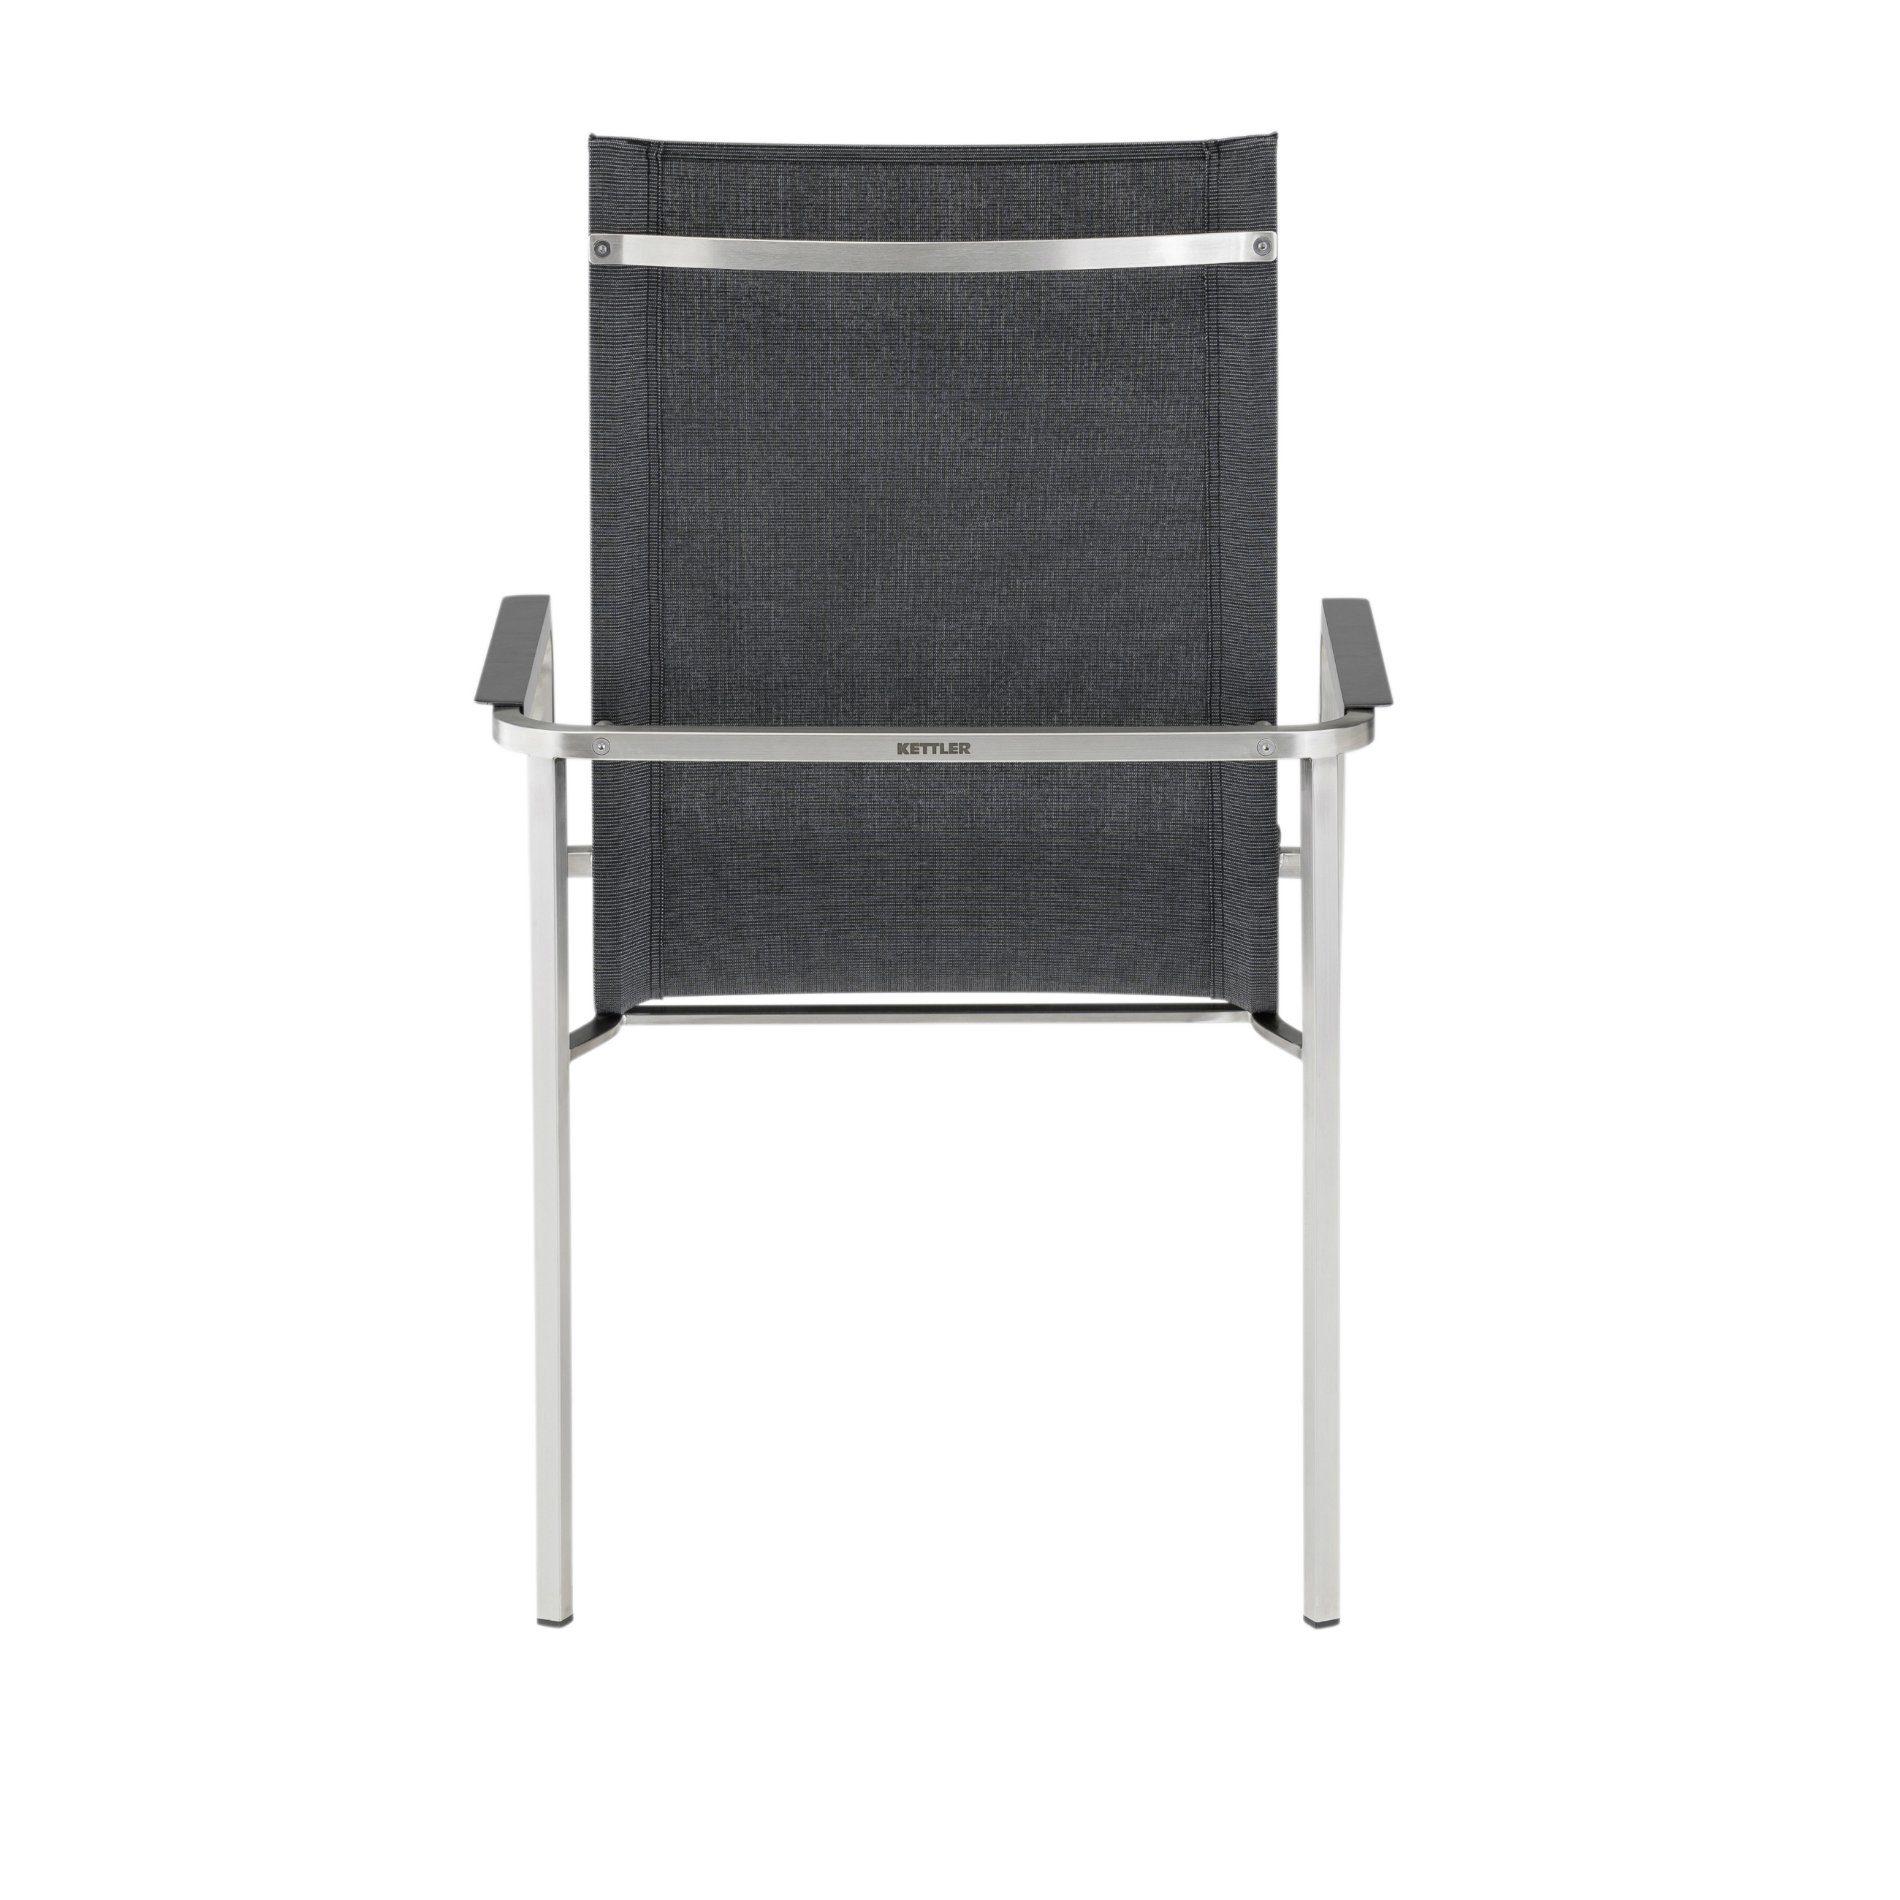 kettler feel stapelsesselr ckenlehne hoch. Black Bedroom Furniture Sets. Home Design Ideas